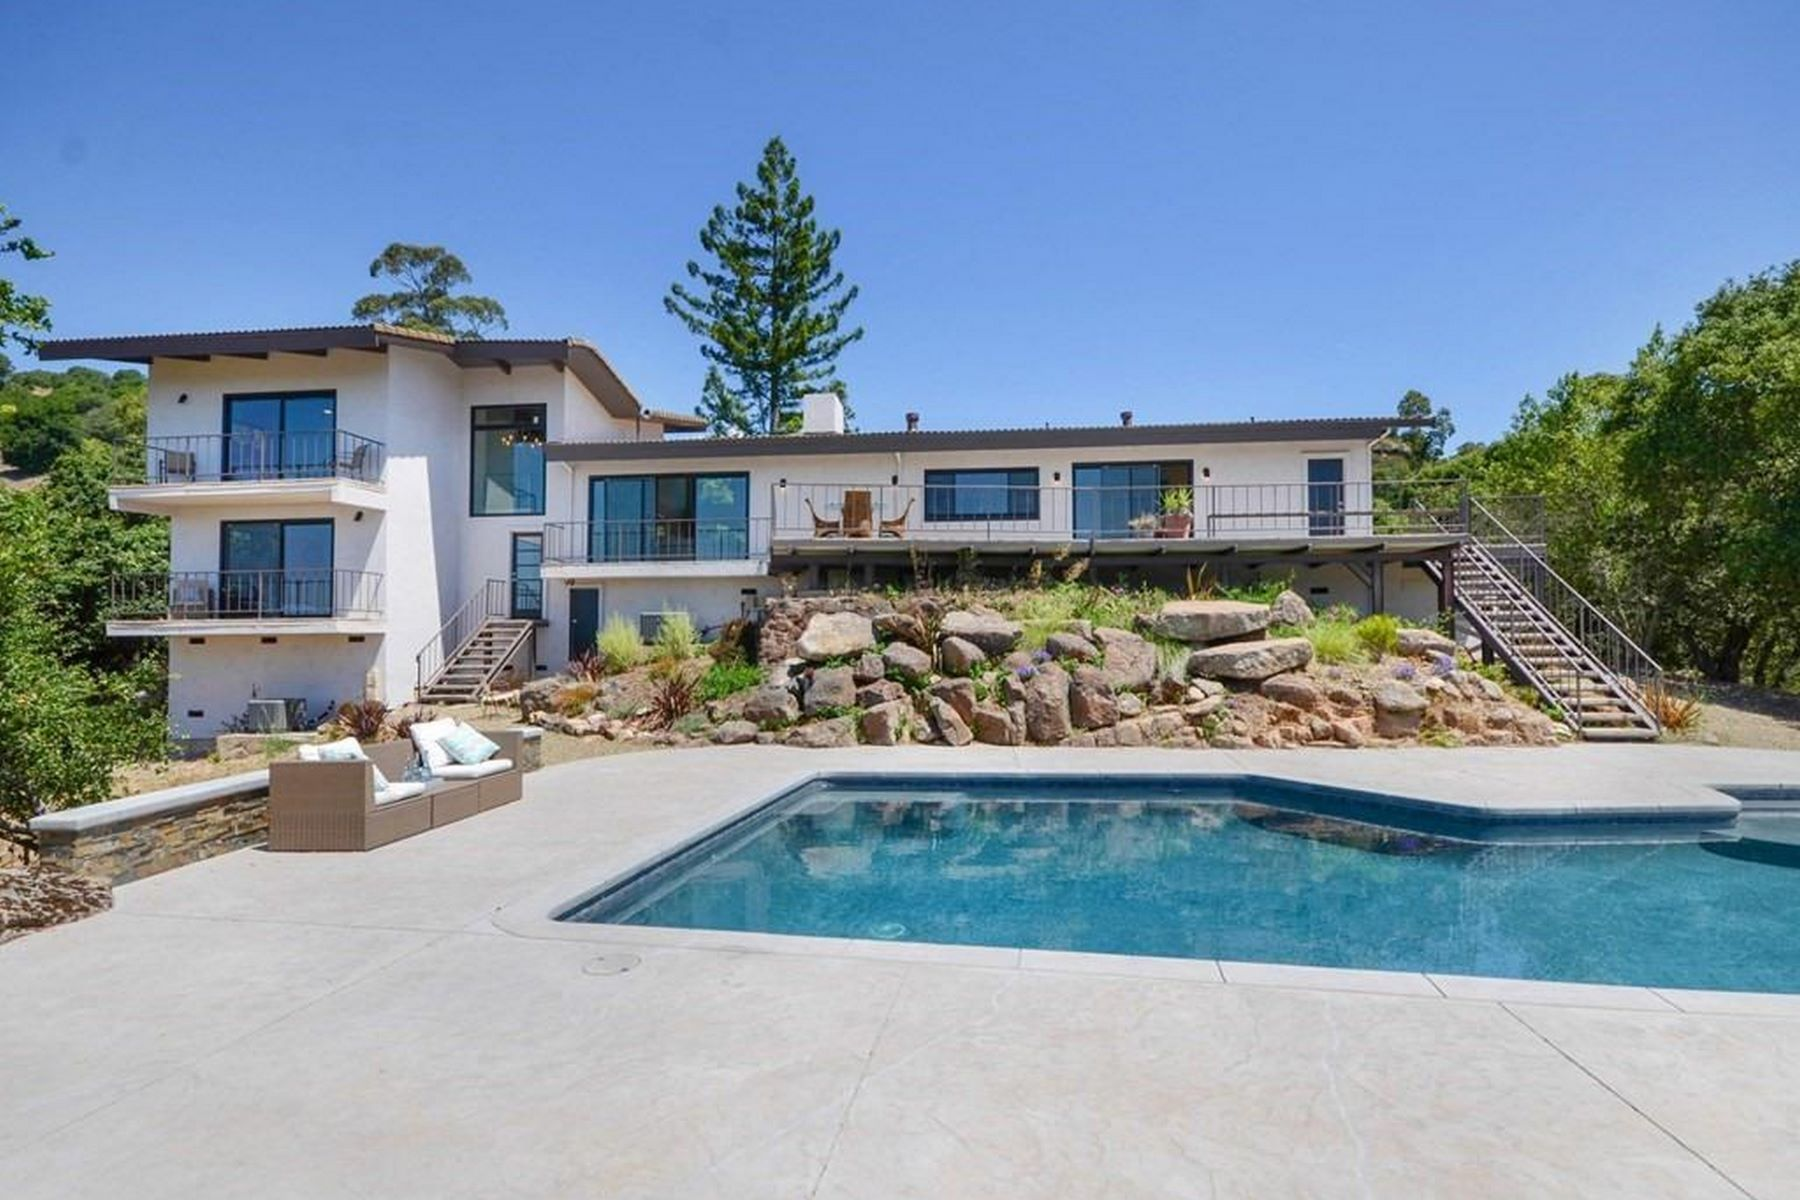 Single Family Homes for Active at Napa Valley Views & Beyond 2670 Atlas Peak Road Napa, California 94558 United States